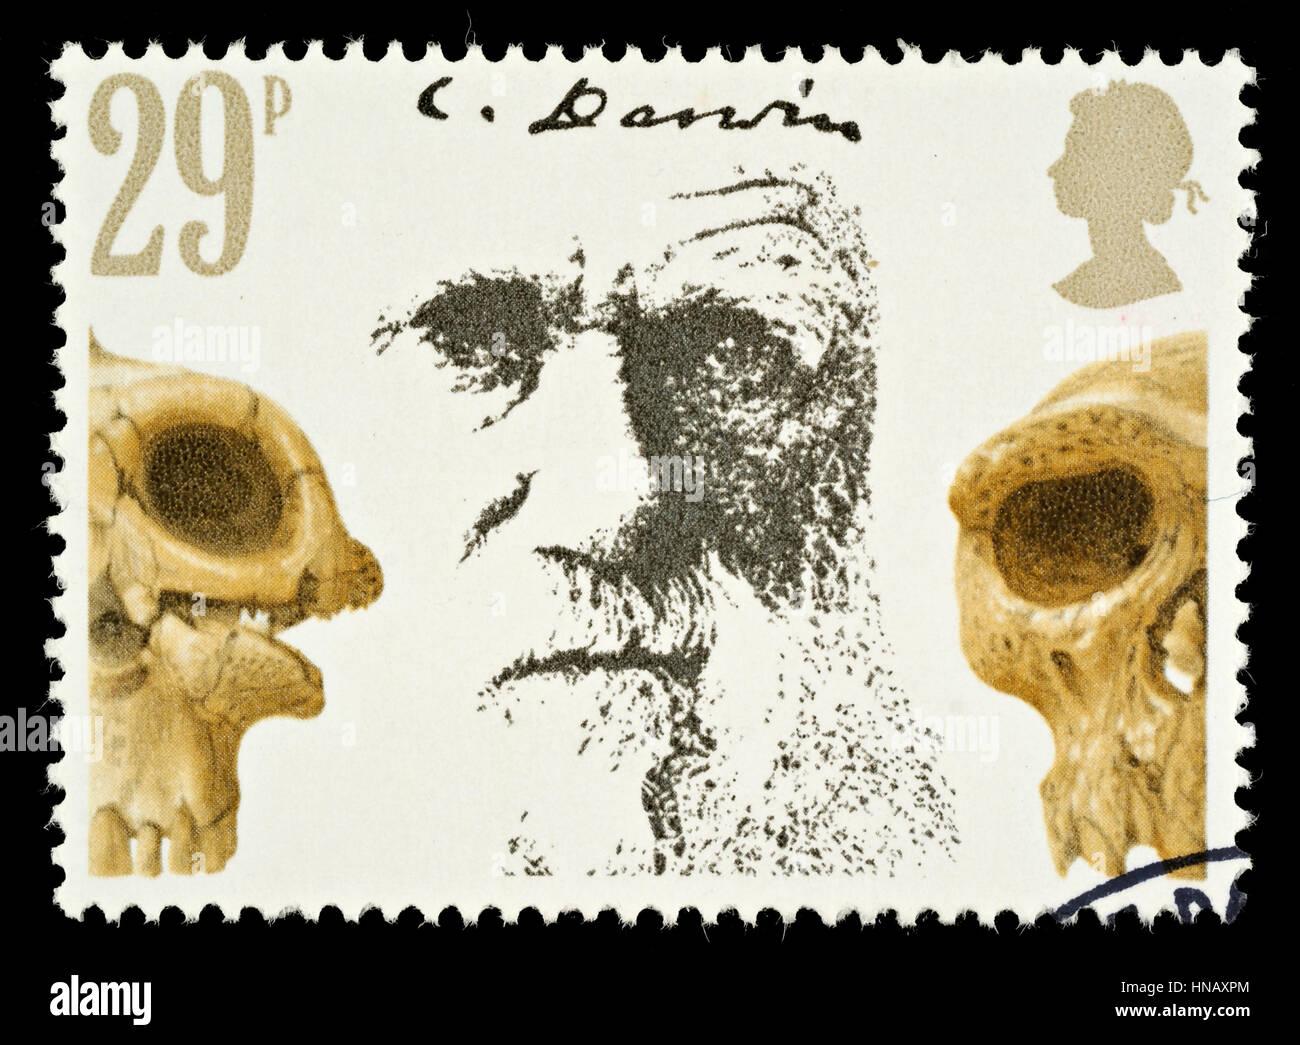 Evolution Theory Stockfotos & Evolution Theory Bilder - Alamy